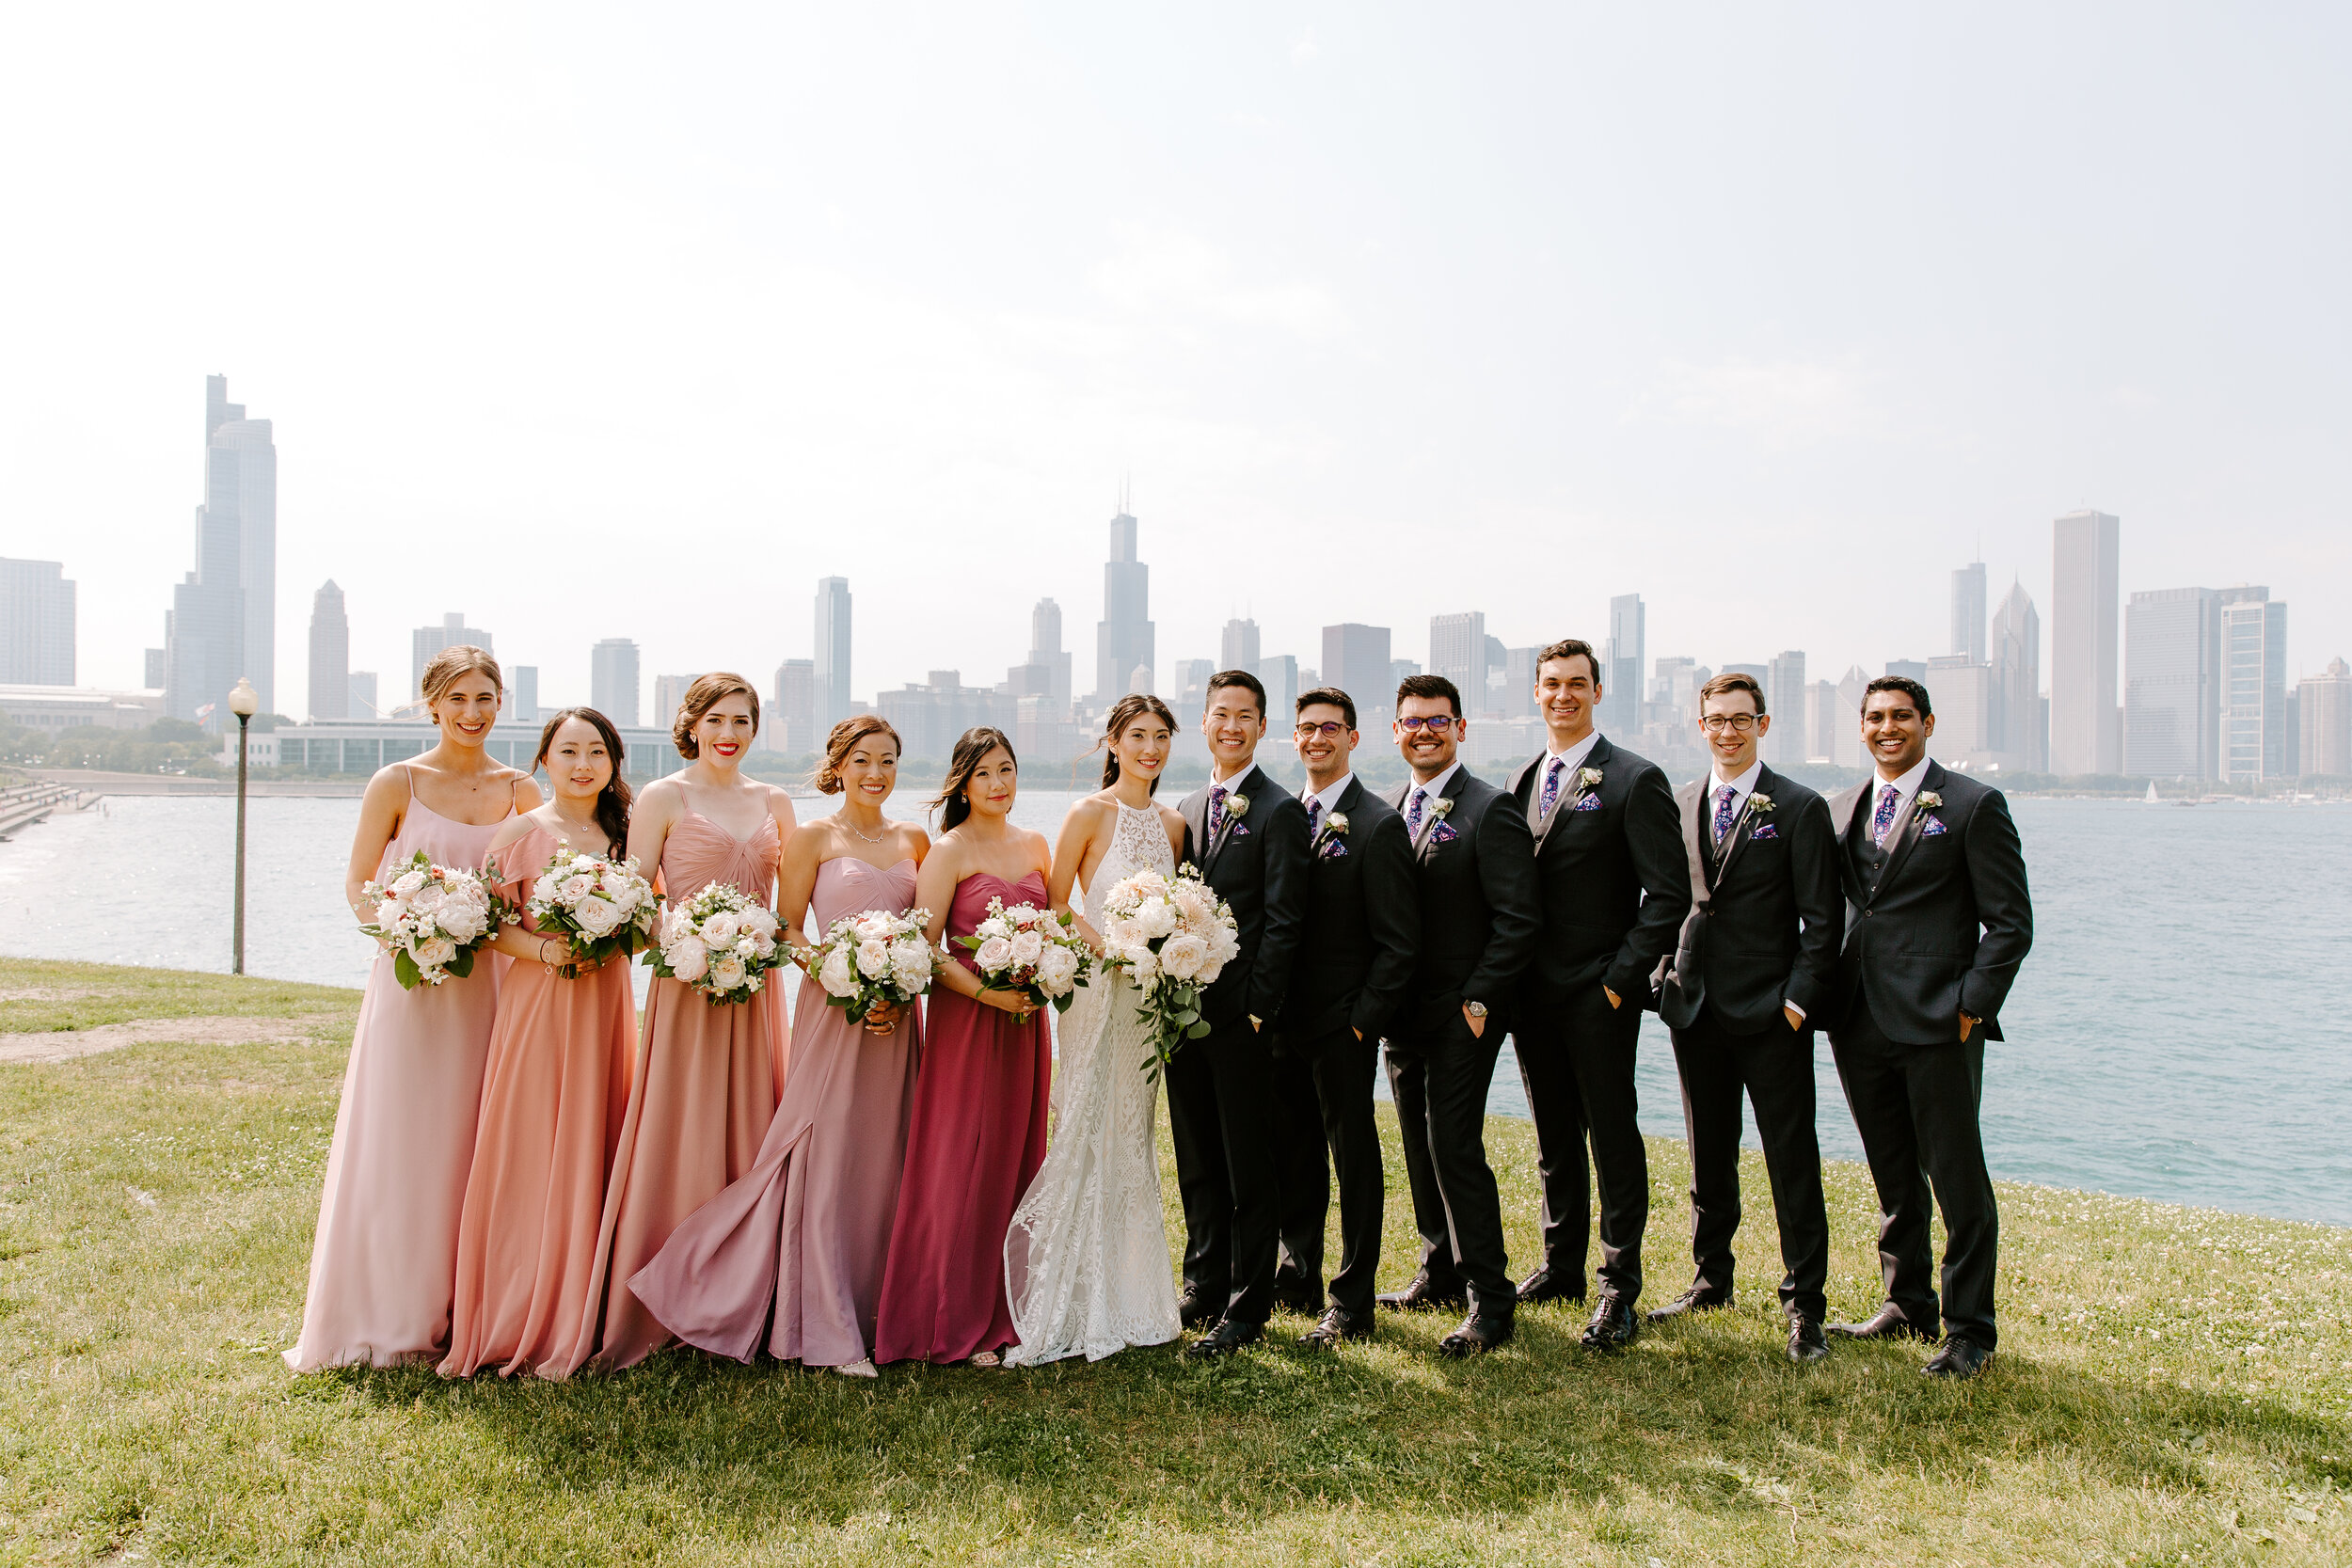 quan wedding-131.jpg